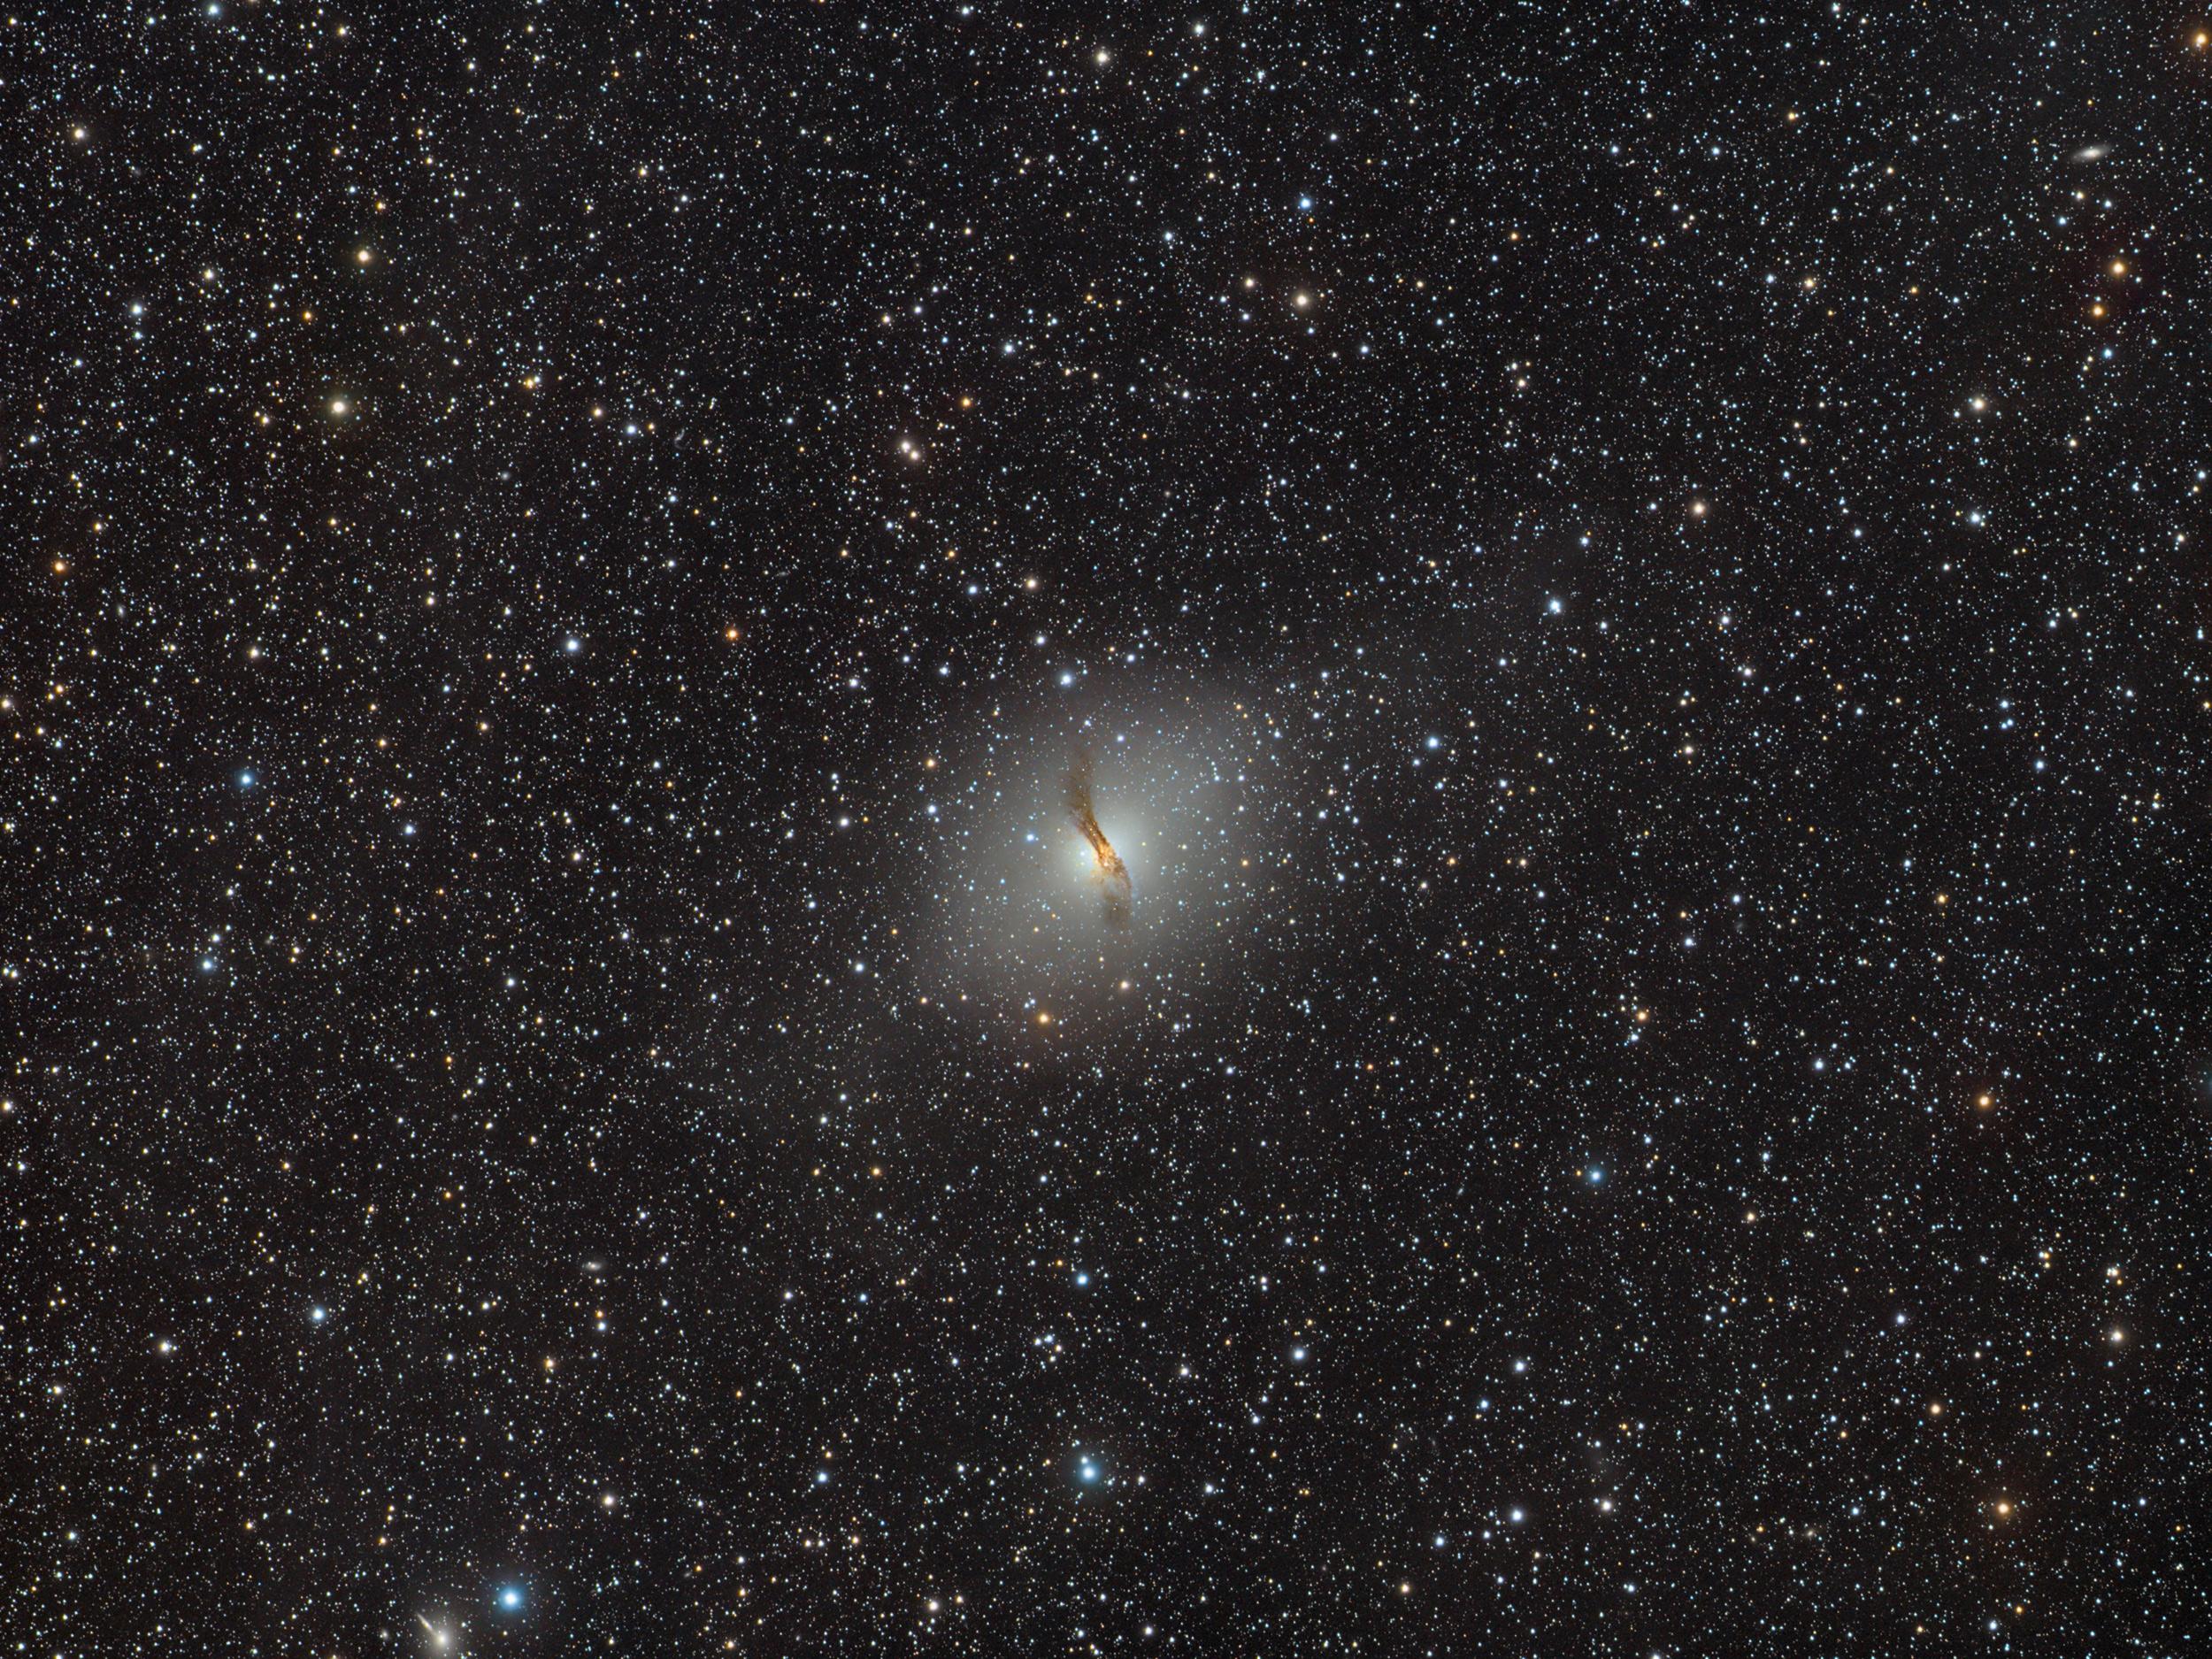 CentaurusA_2019_2500.jpg